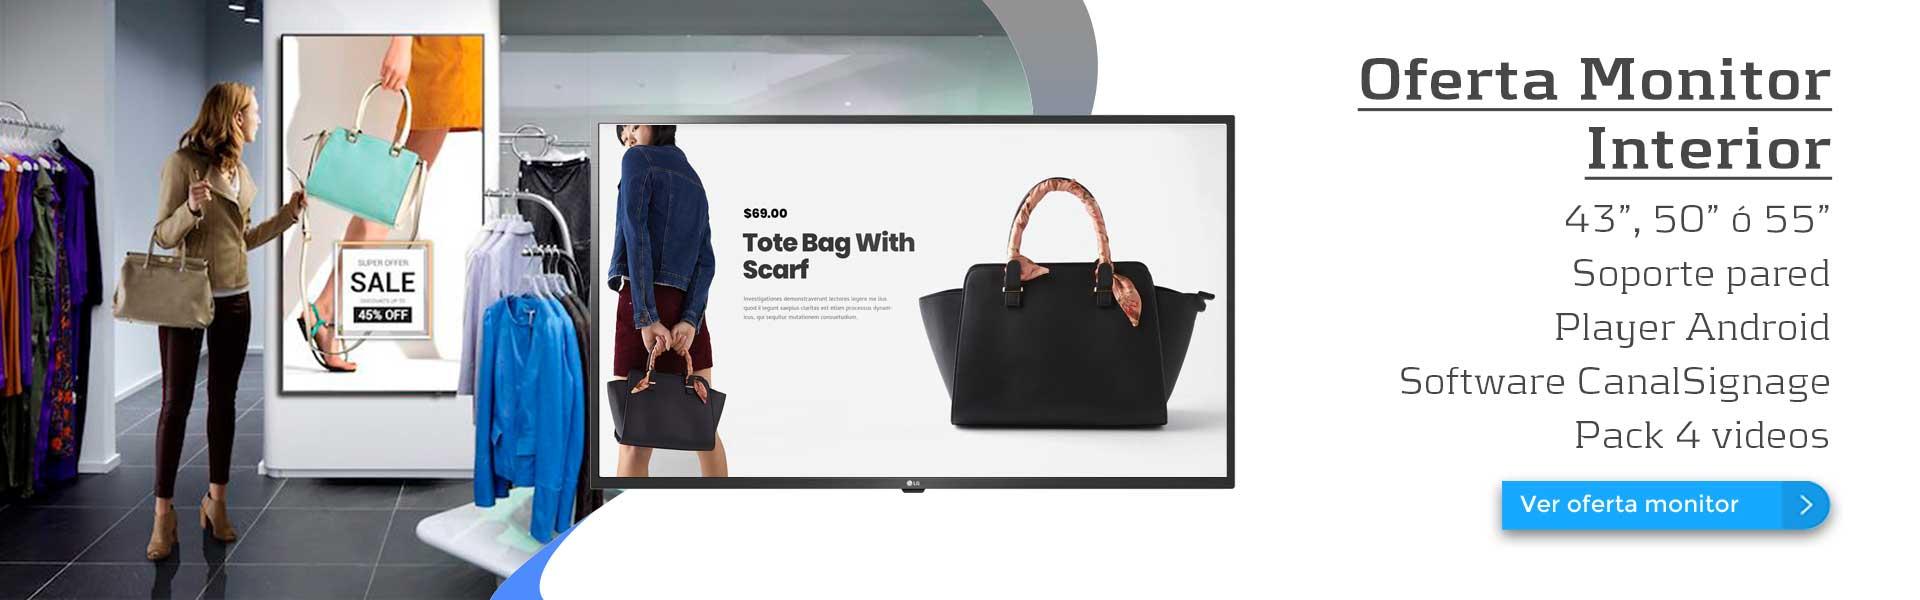 Oferta monitor para interior LG